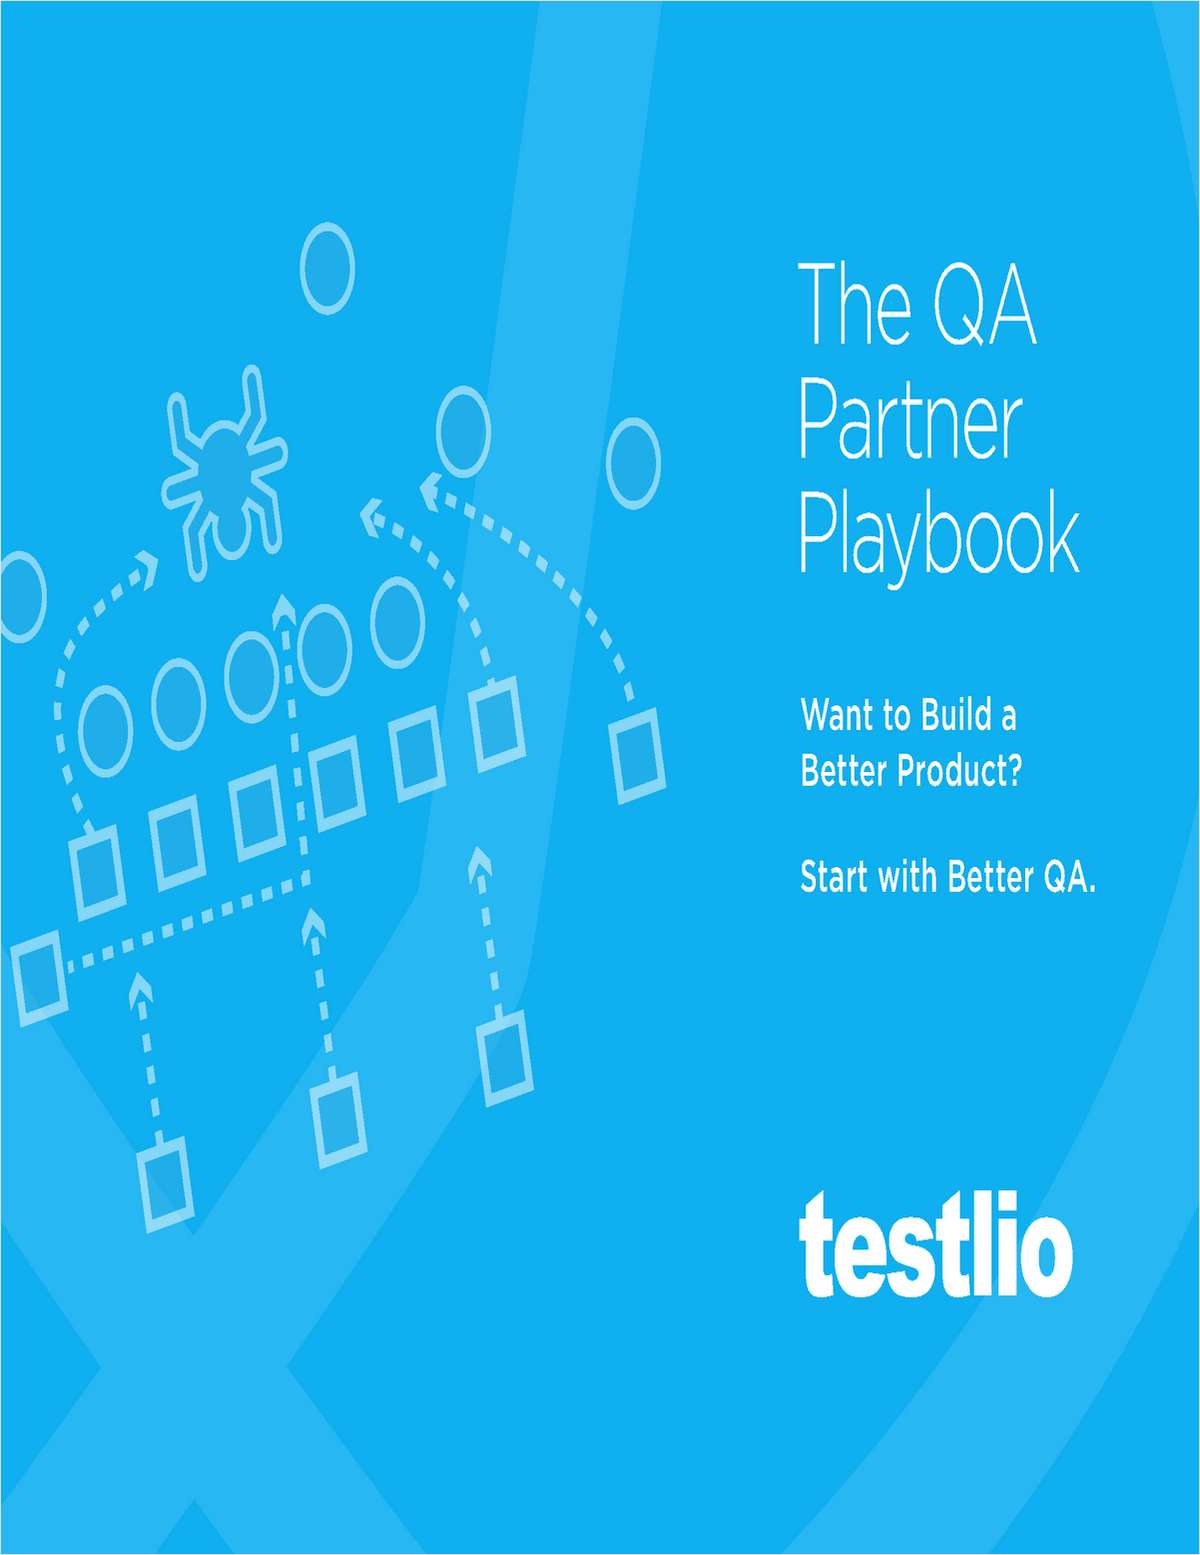 The QA Partner Playbook